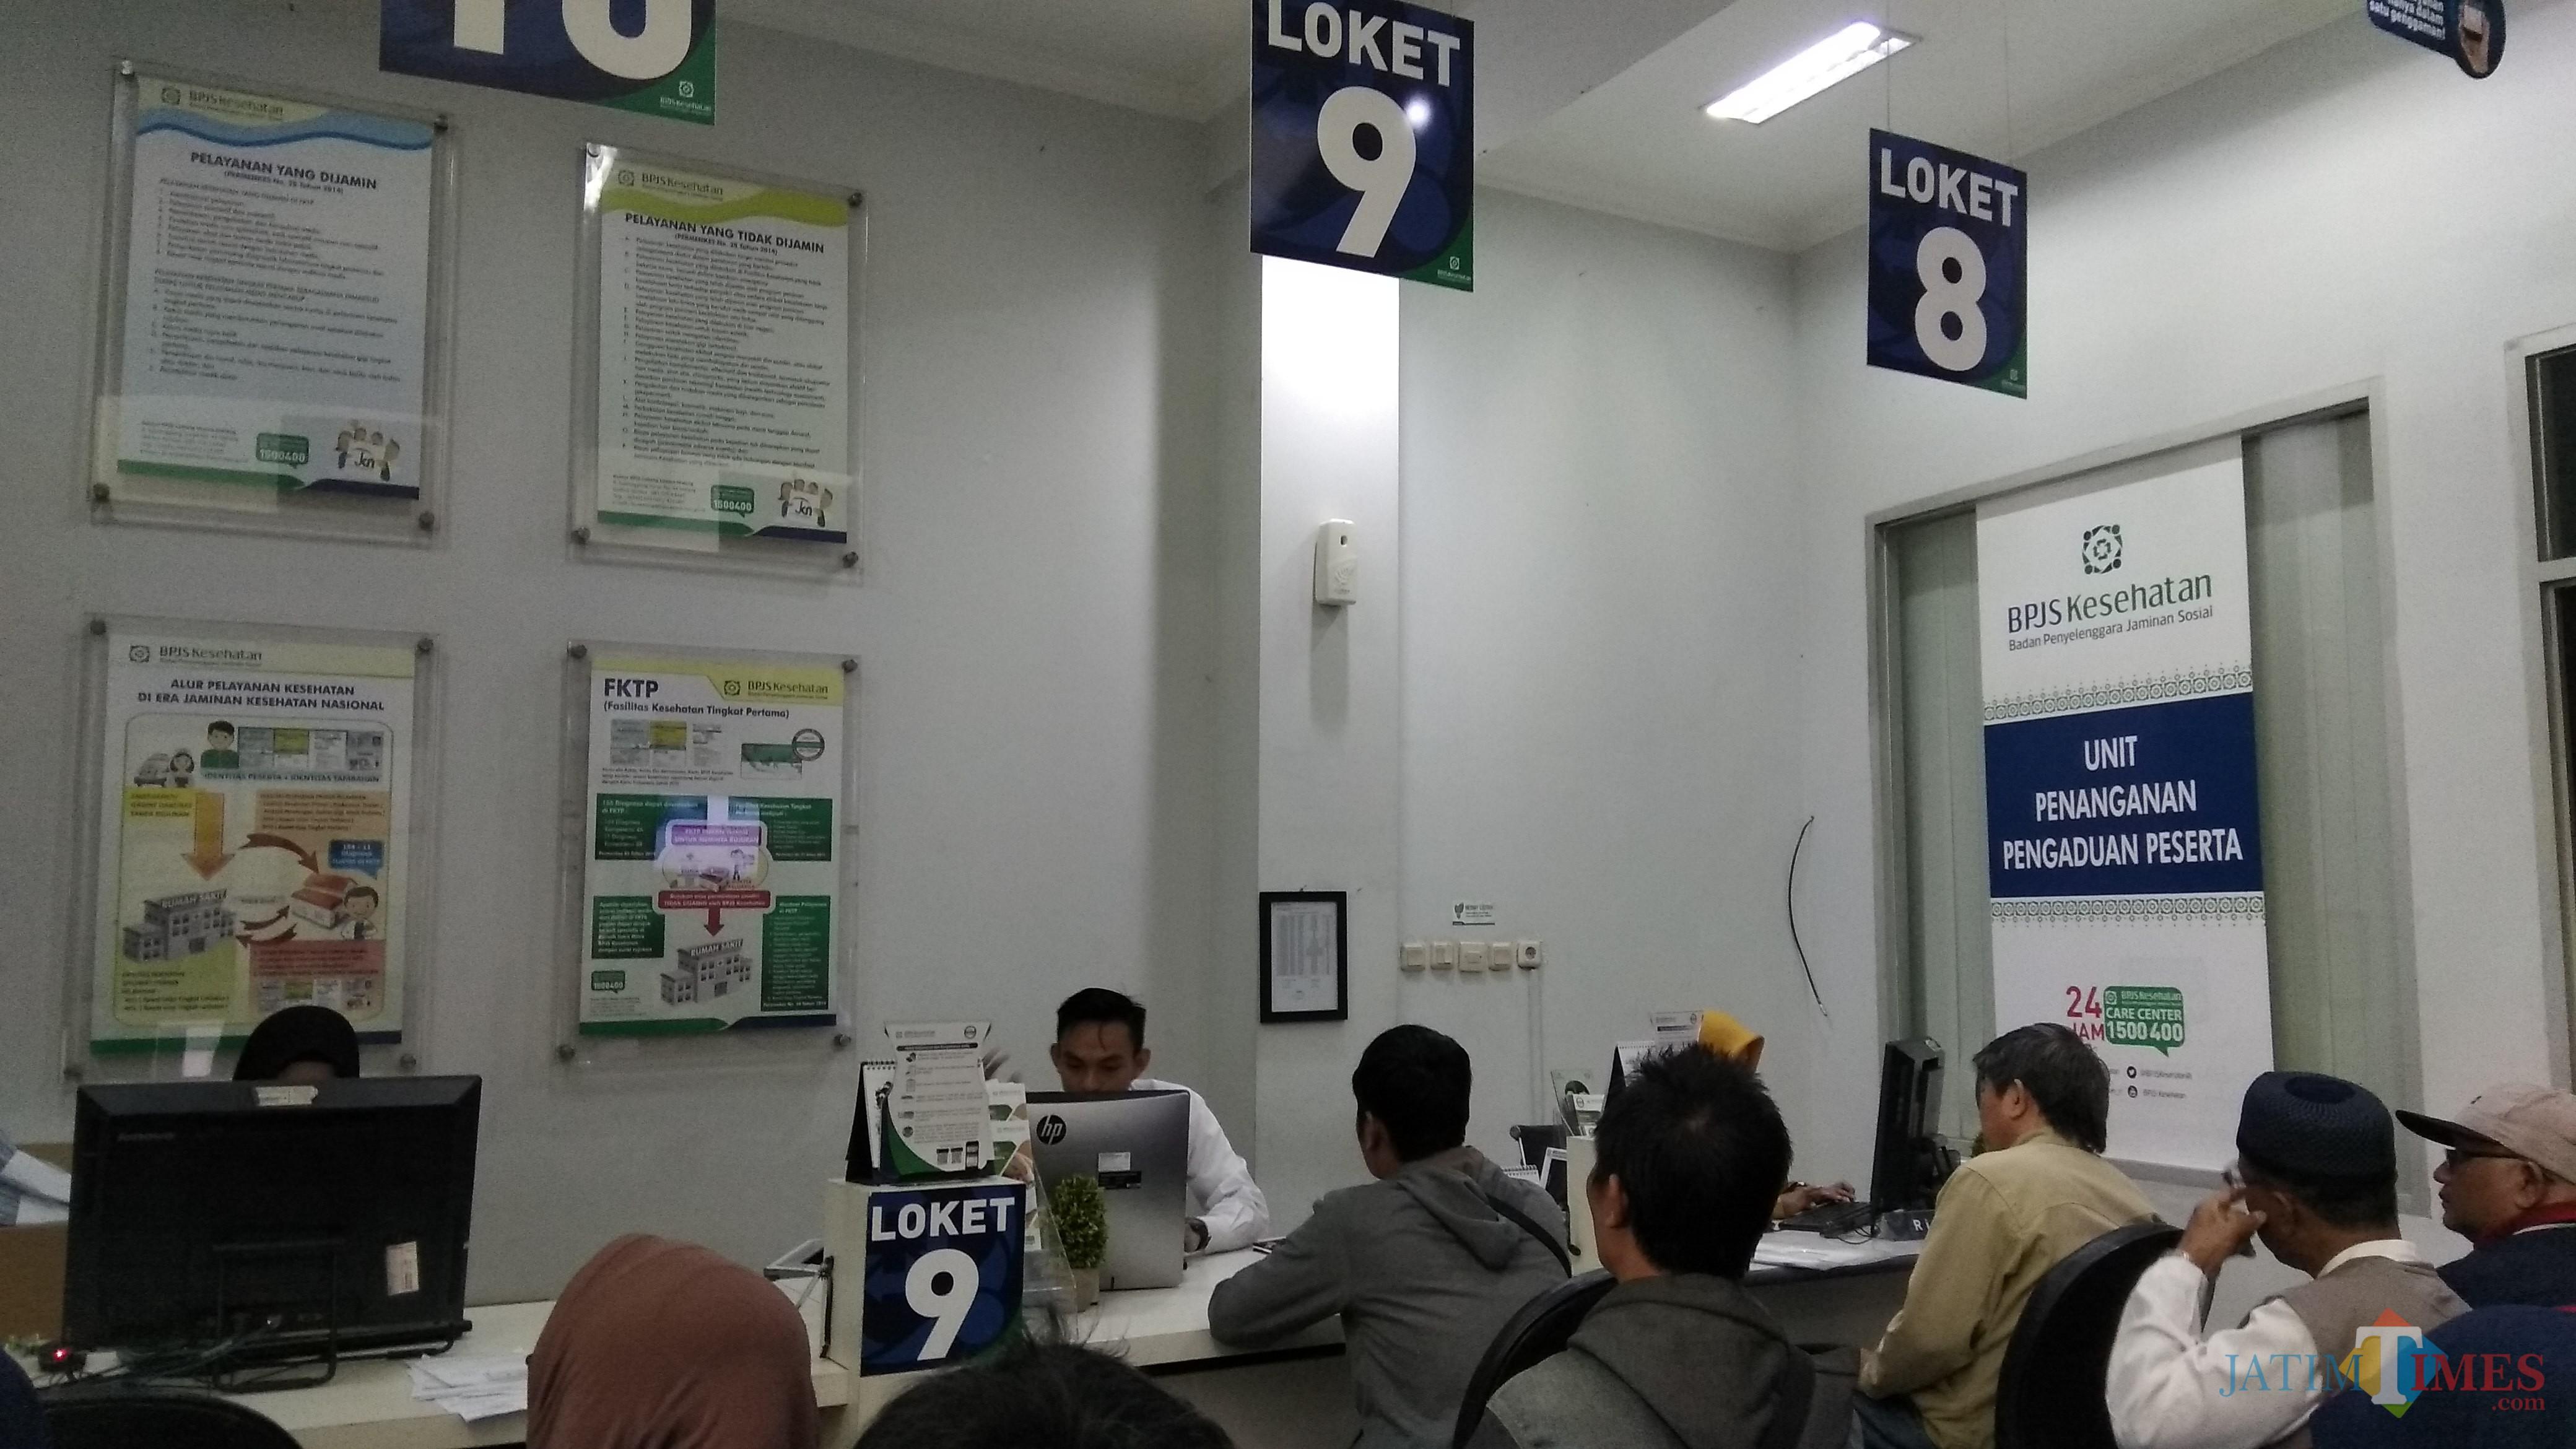 Warga tengah melakukan pendaftaran kepesertaan BPJS Kesehatan di Kantor Cabang Malang di Jalan Tumenggung Suryo, Kota Malang. (Foto: Nurlayla Ratri/MalangTIMES)